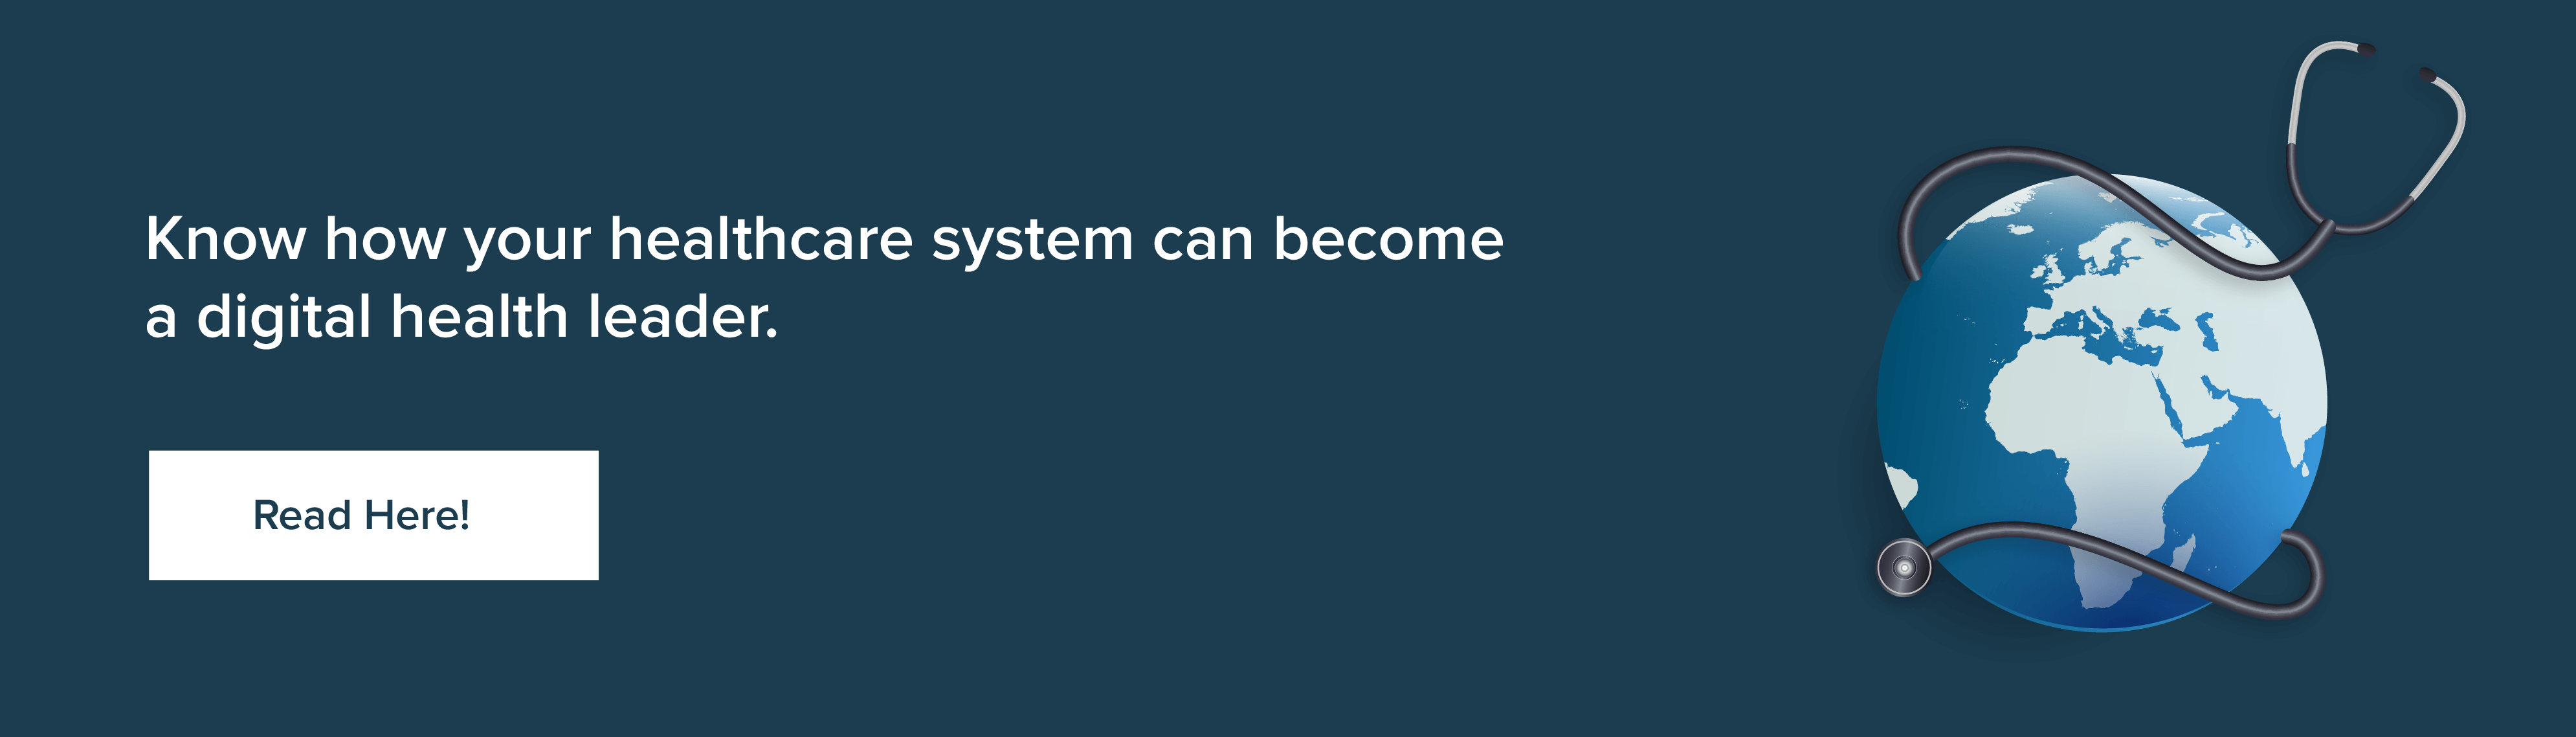 healthcare system to digital health leader